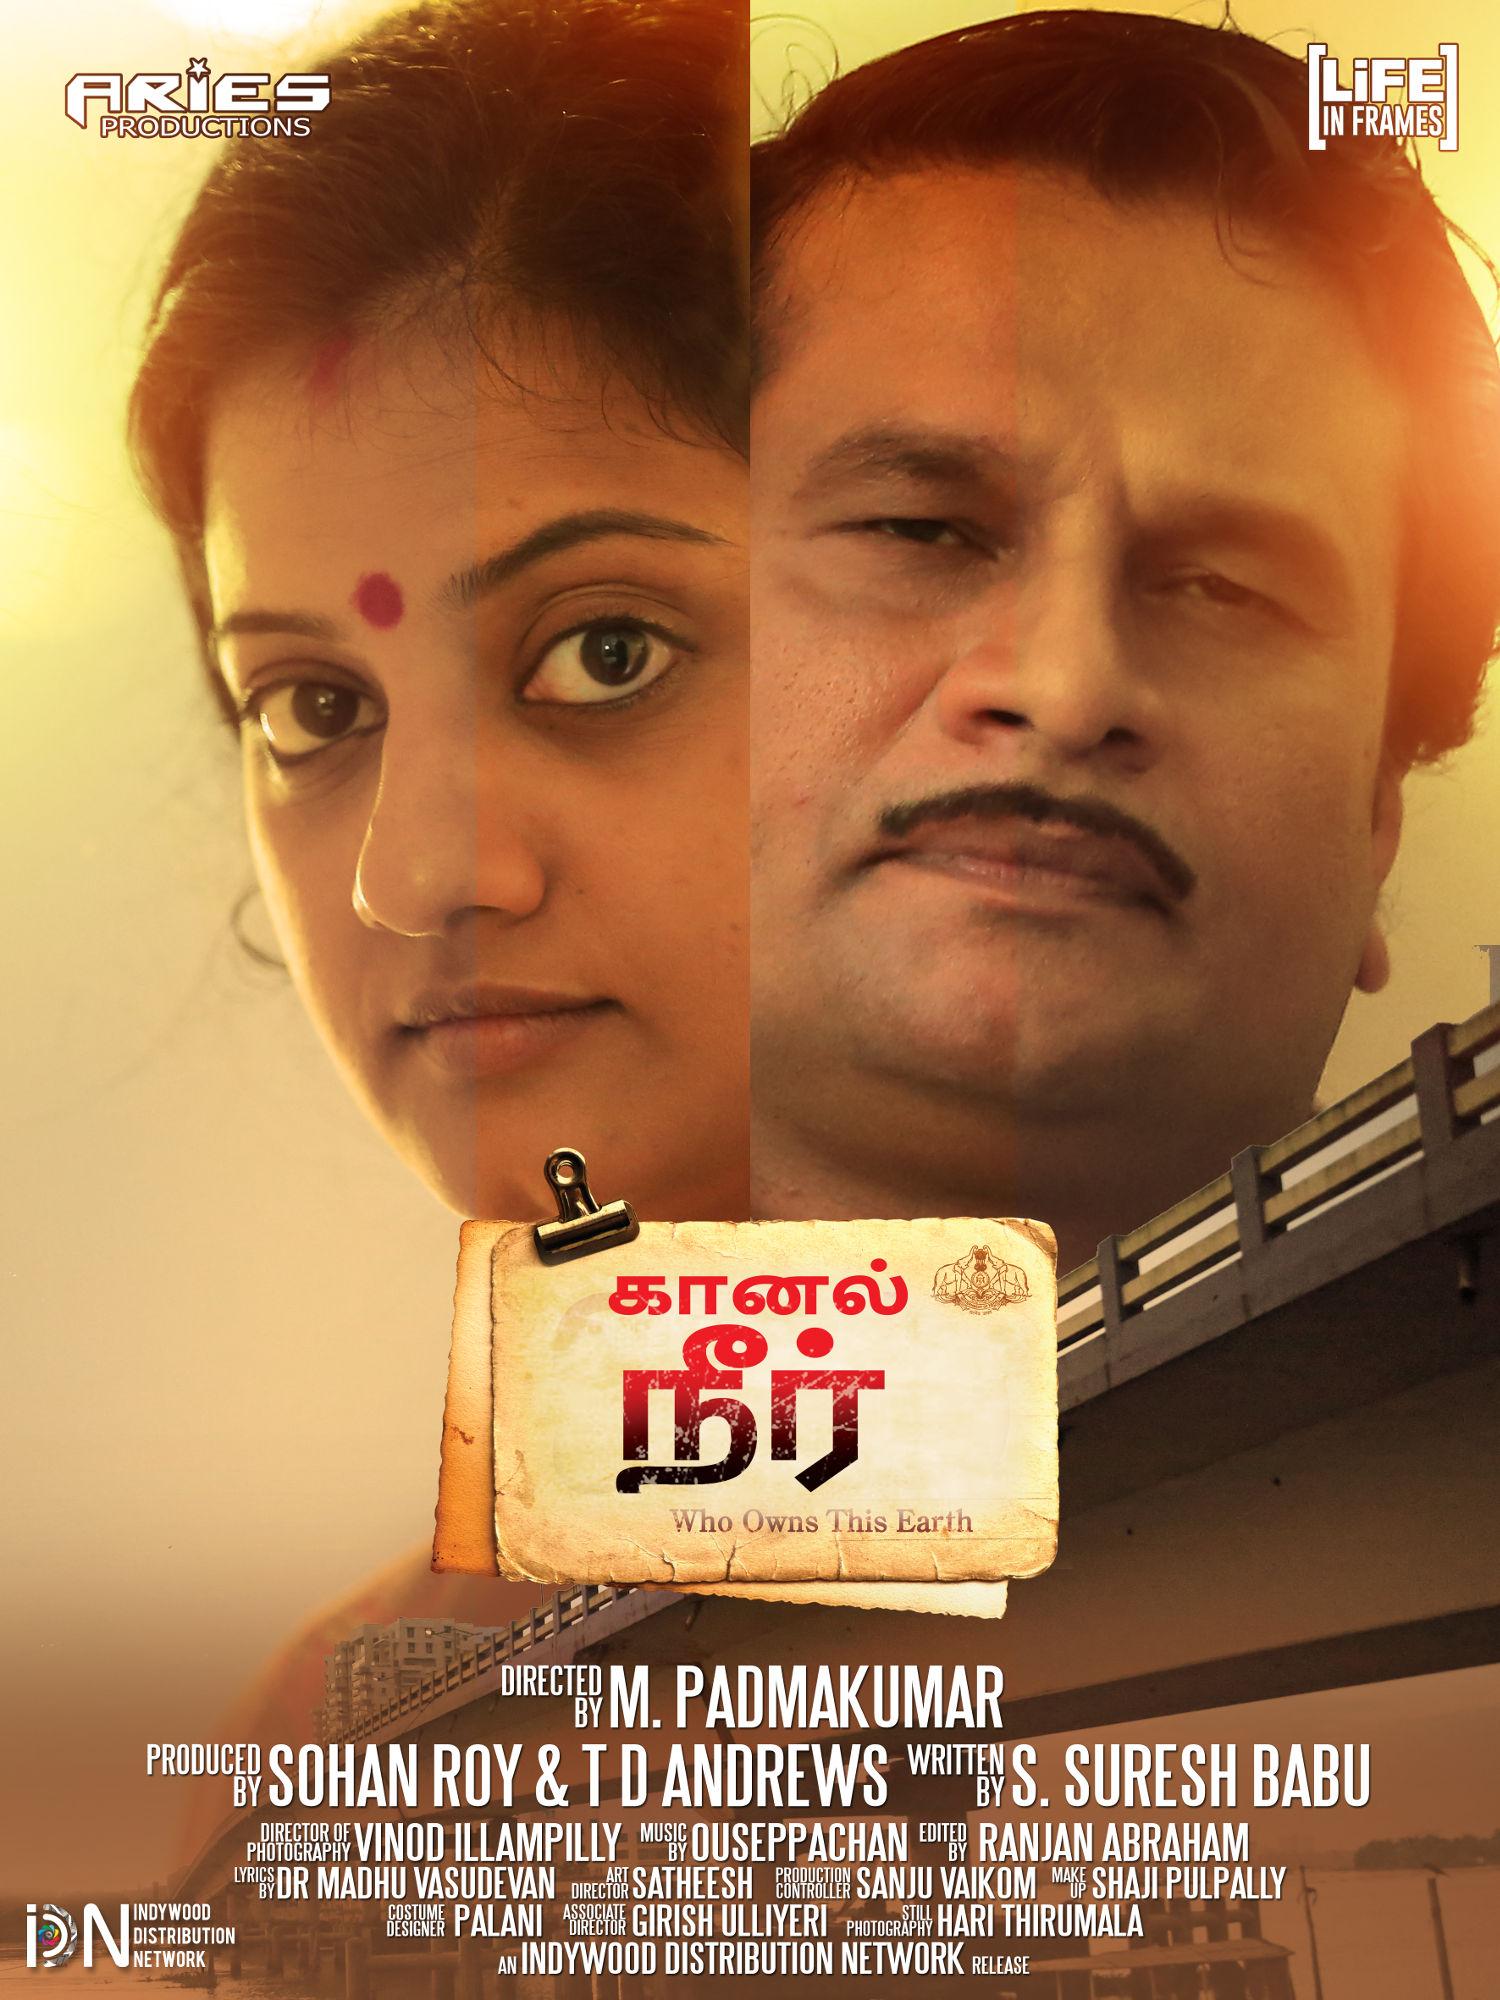 Priyanka Nair Hareesh Peradi Kaanal Neer Movie Poster